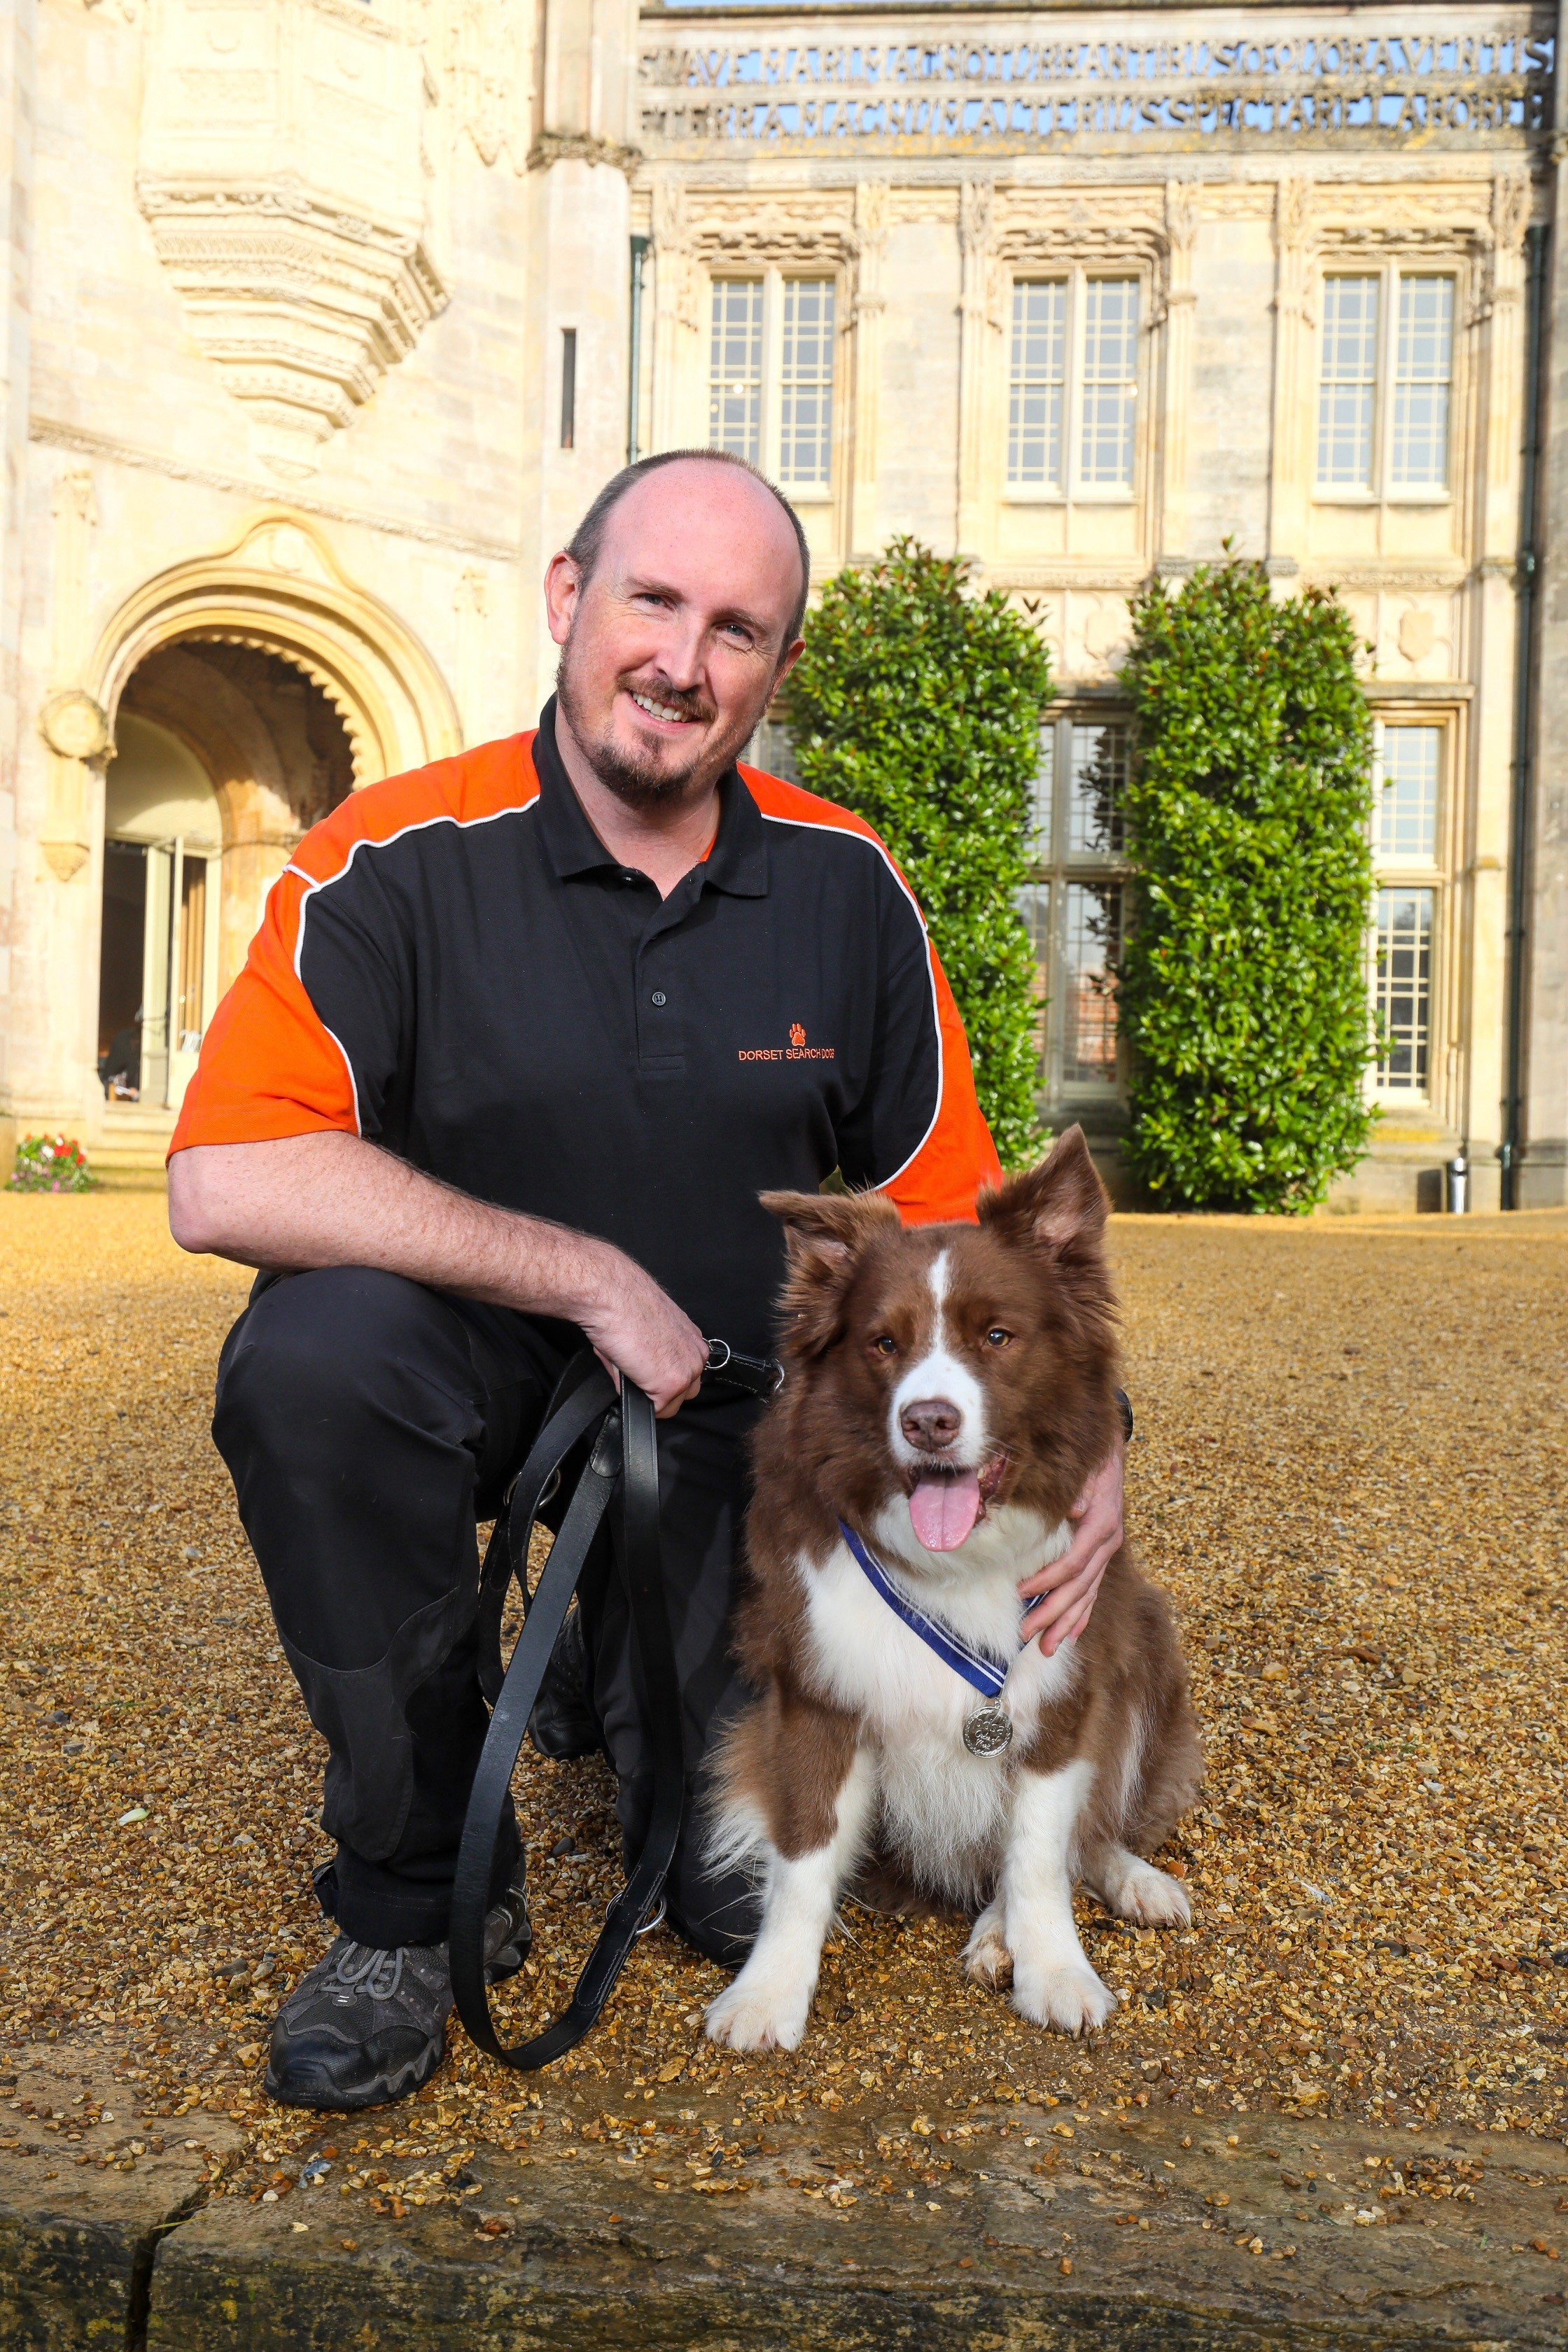 Dorset Search dog posthumously awarded PDSA Order of Merit